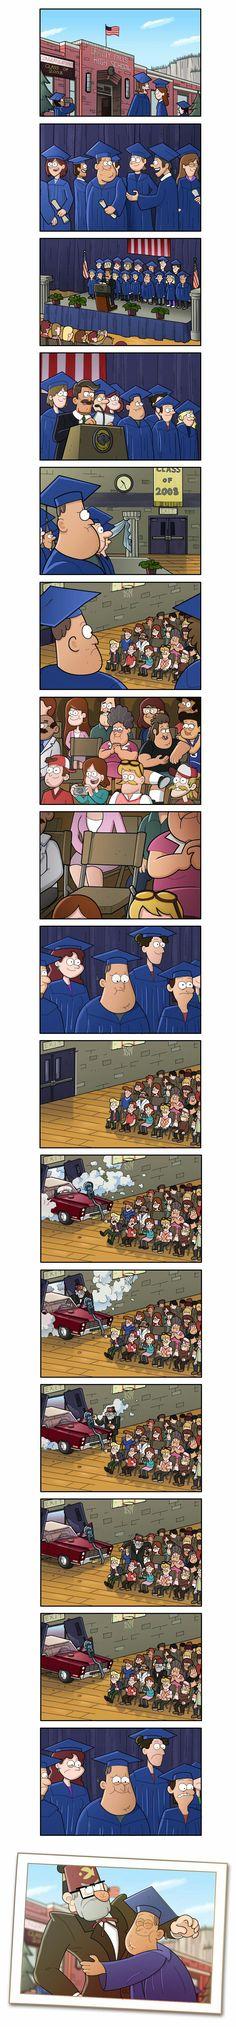 57 Ideas Funny Art Memes Gravity Falls For 2019 Gravity Falls Comics, Gravity Falls Art, Billdip, Dipper Et Mabel, Phineas Und Ferb, Desenhos Gravity Falls, Grabity Falls, Accel World, Reverse Falls